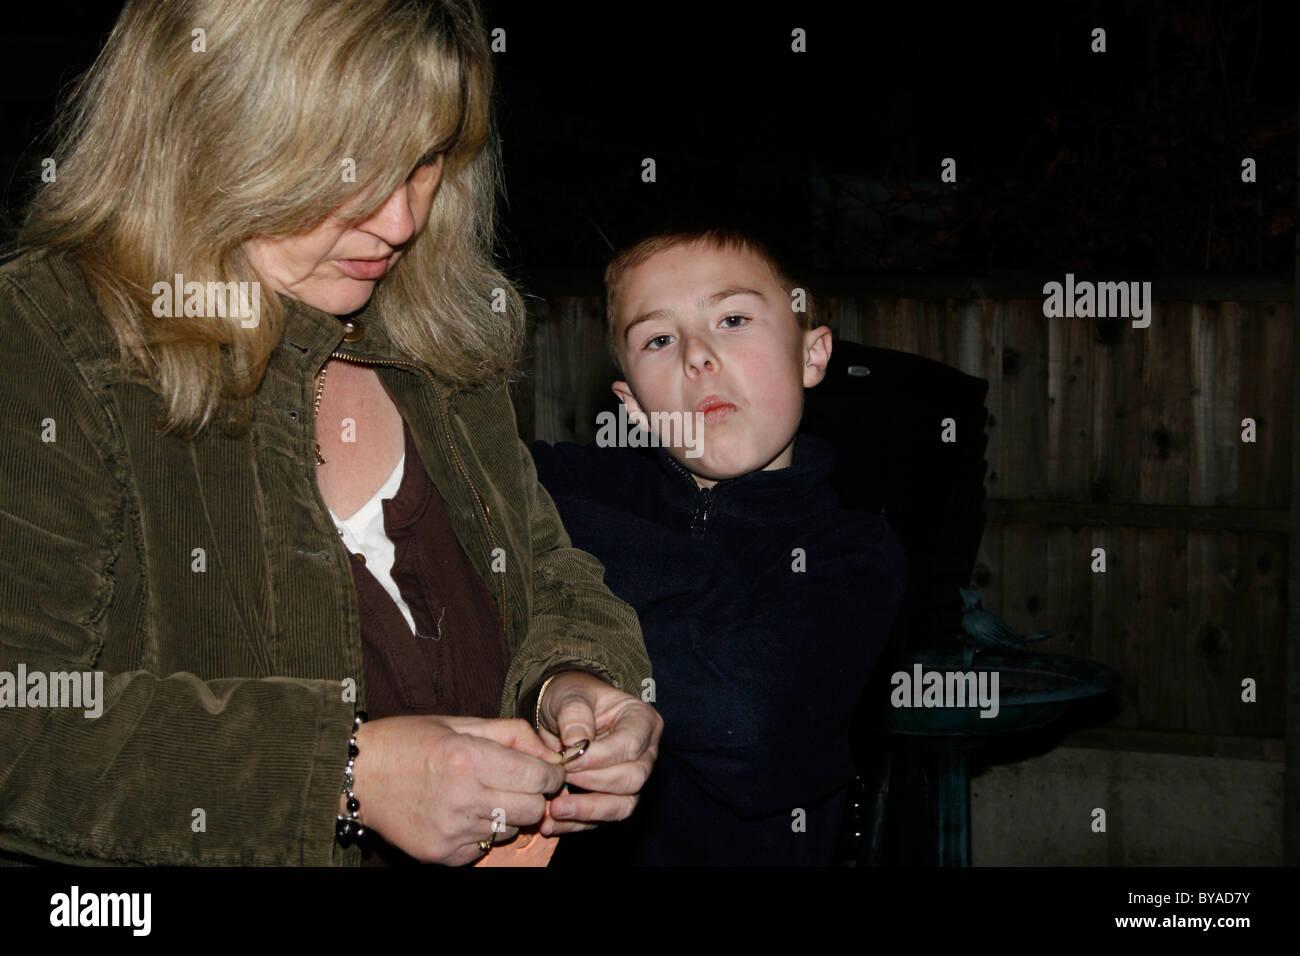 woman examining ring with boy Stock Photo